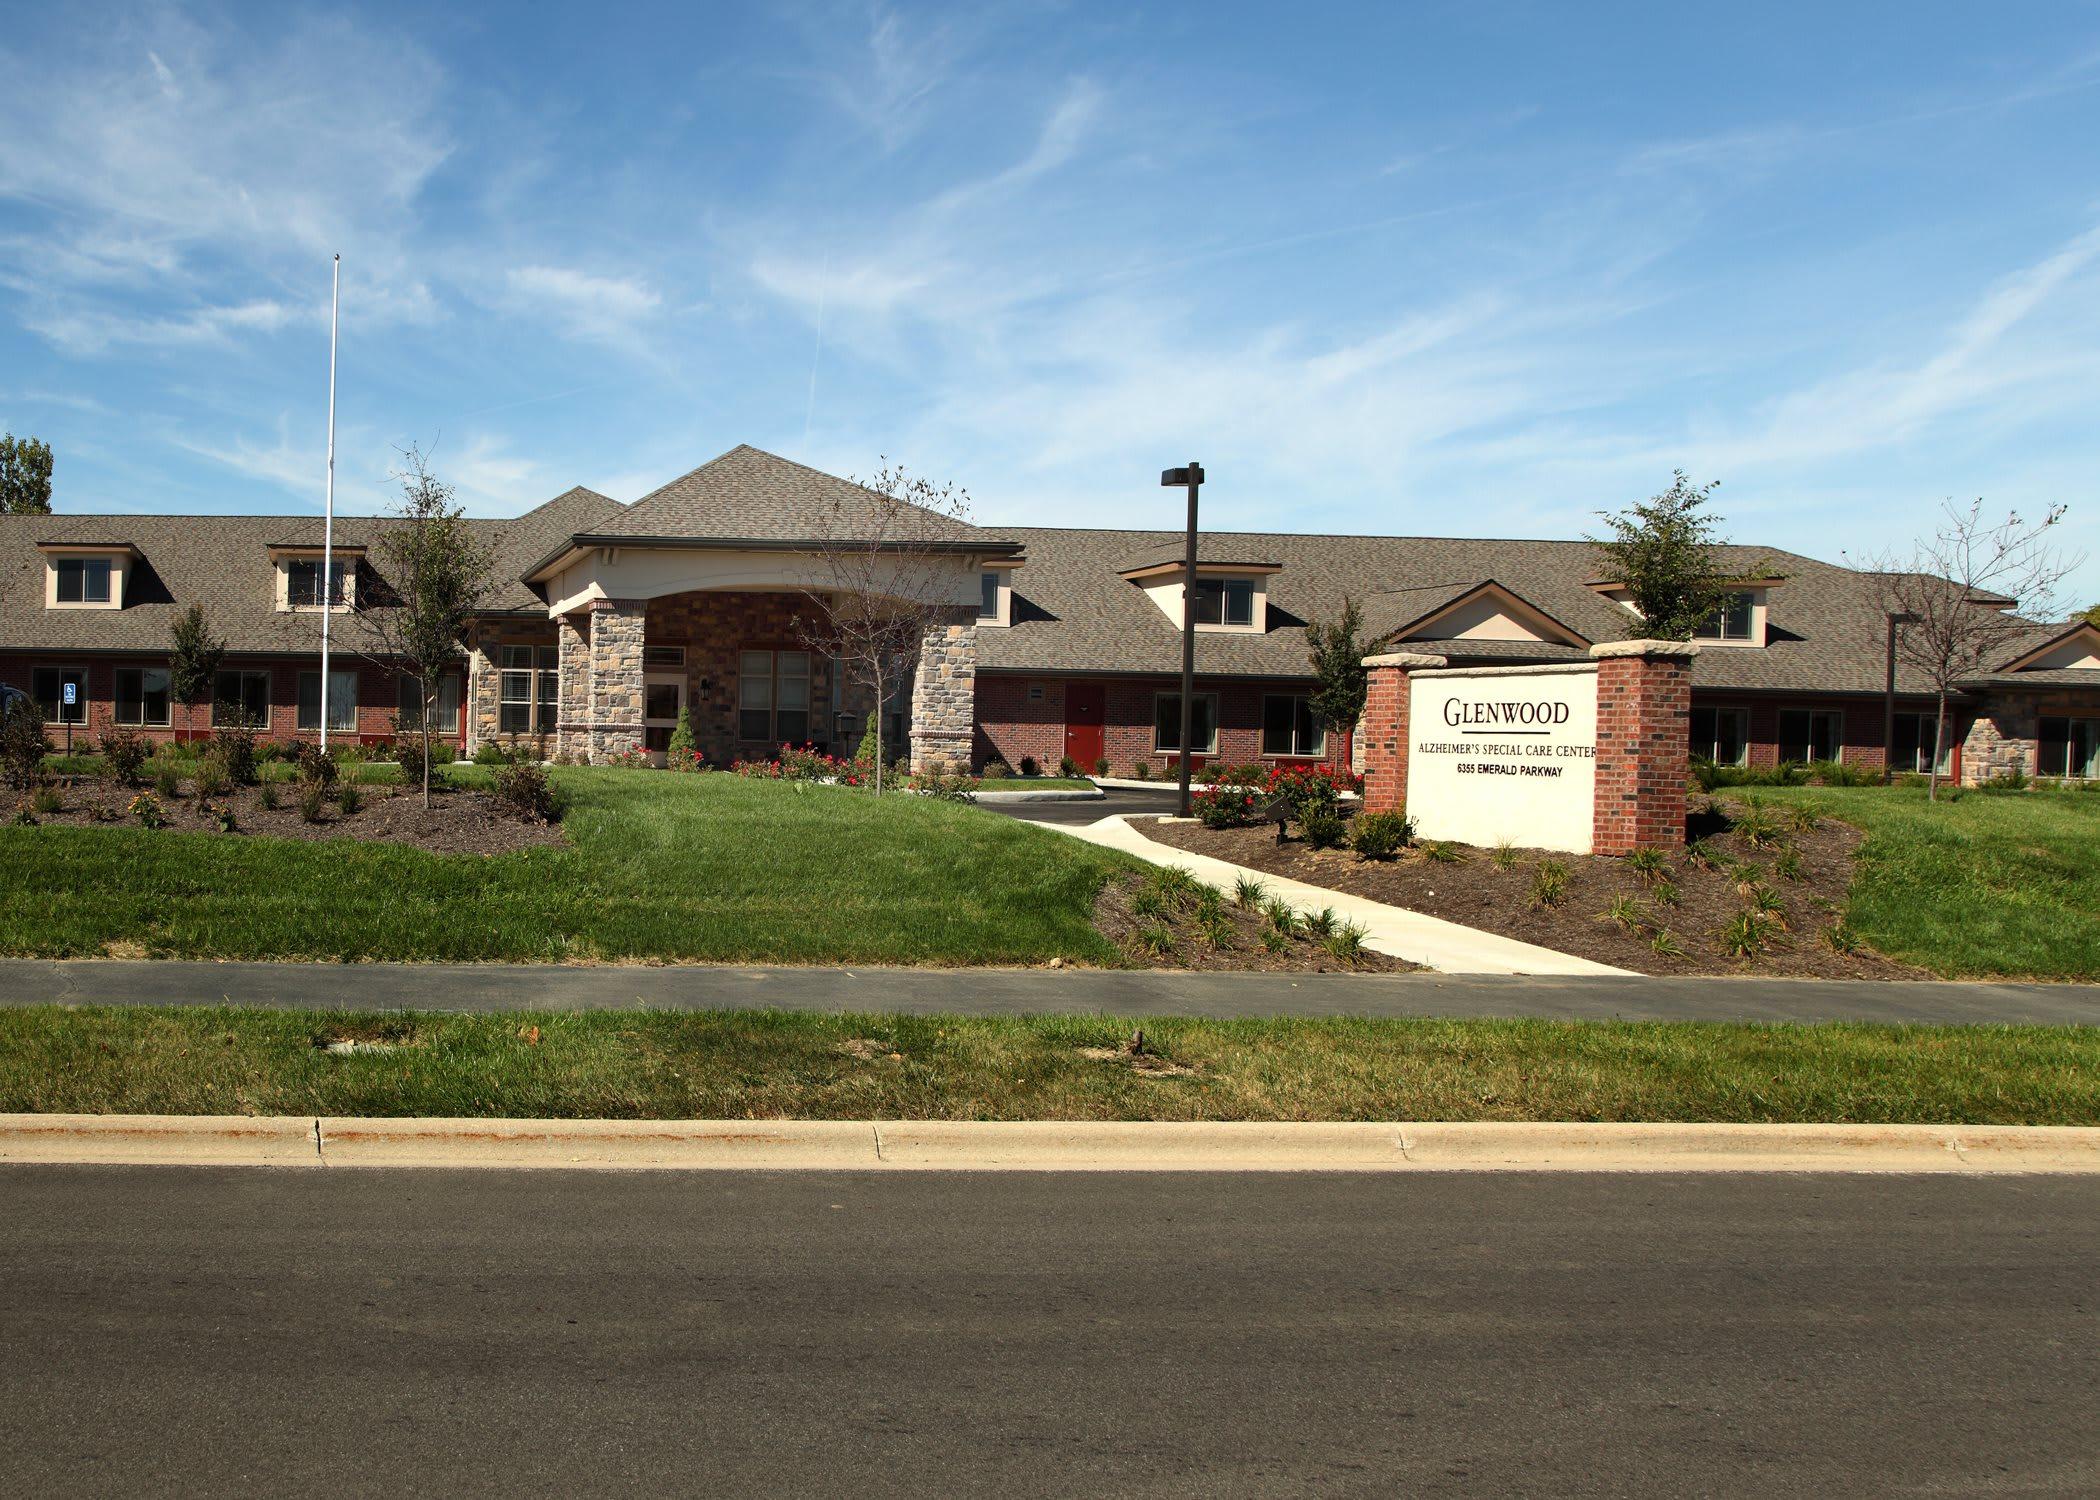 Photo 1 of Glenwood Alzheimer's Special Care Center